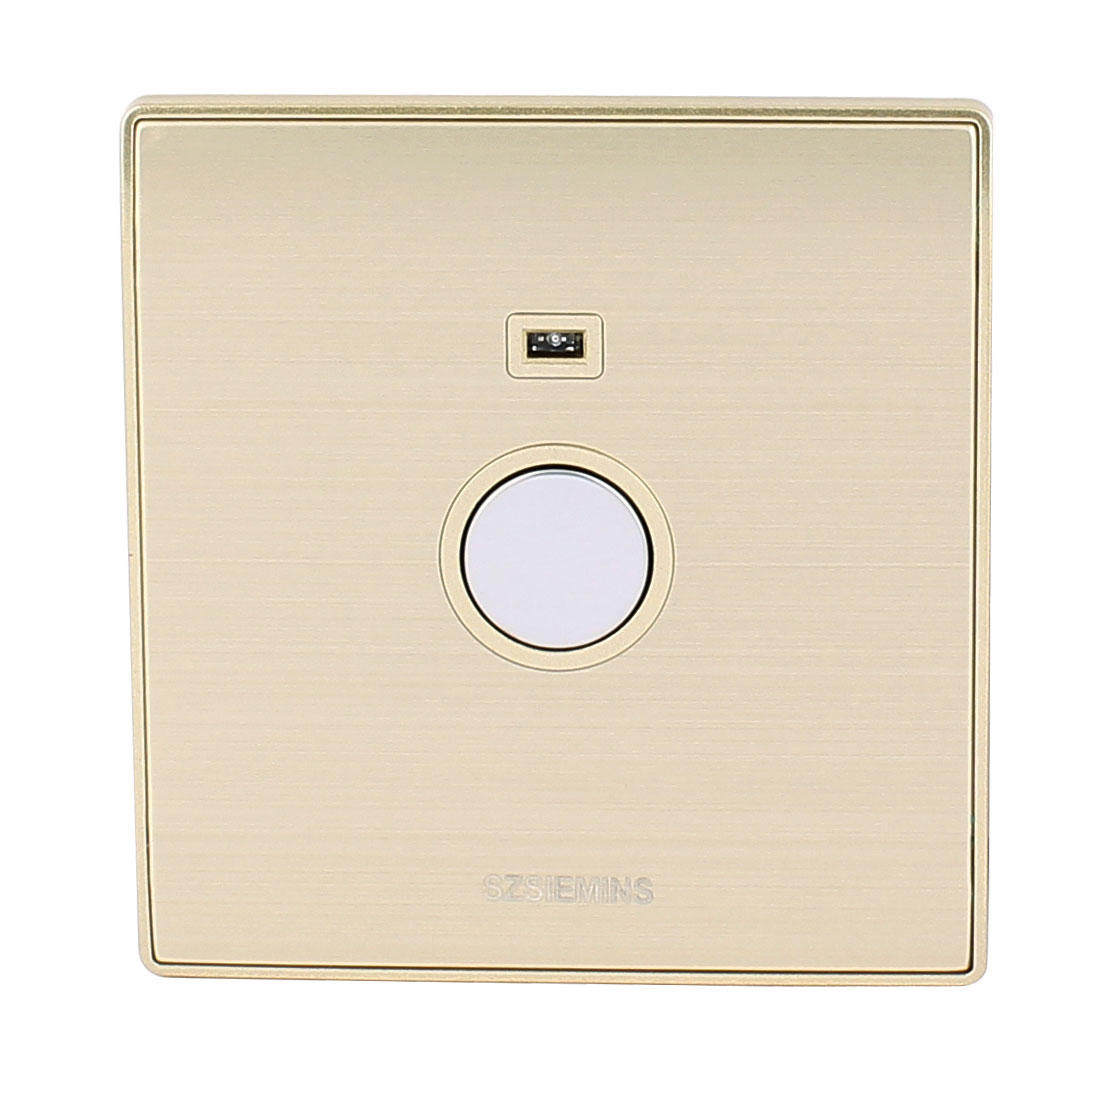 AC 160V-250V Noctilucent Indicator Light Touch Sensor Energy Saving Light Delay Switch Champagne Gold